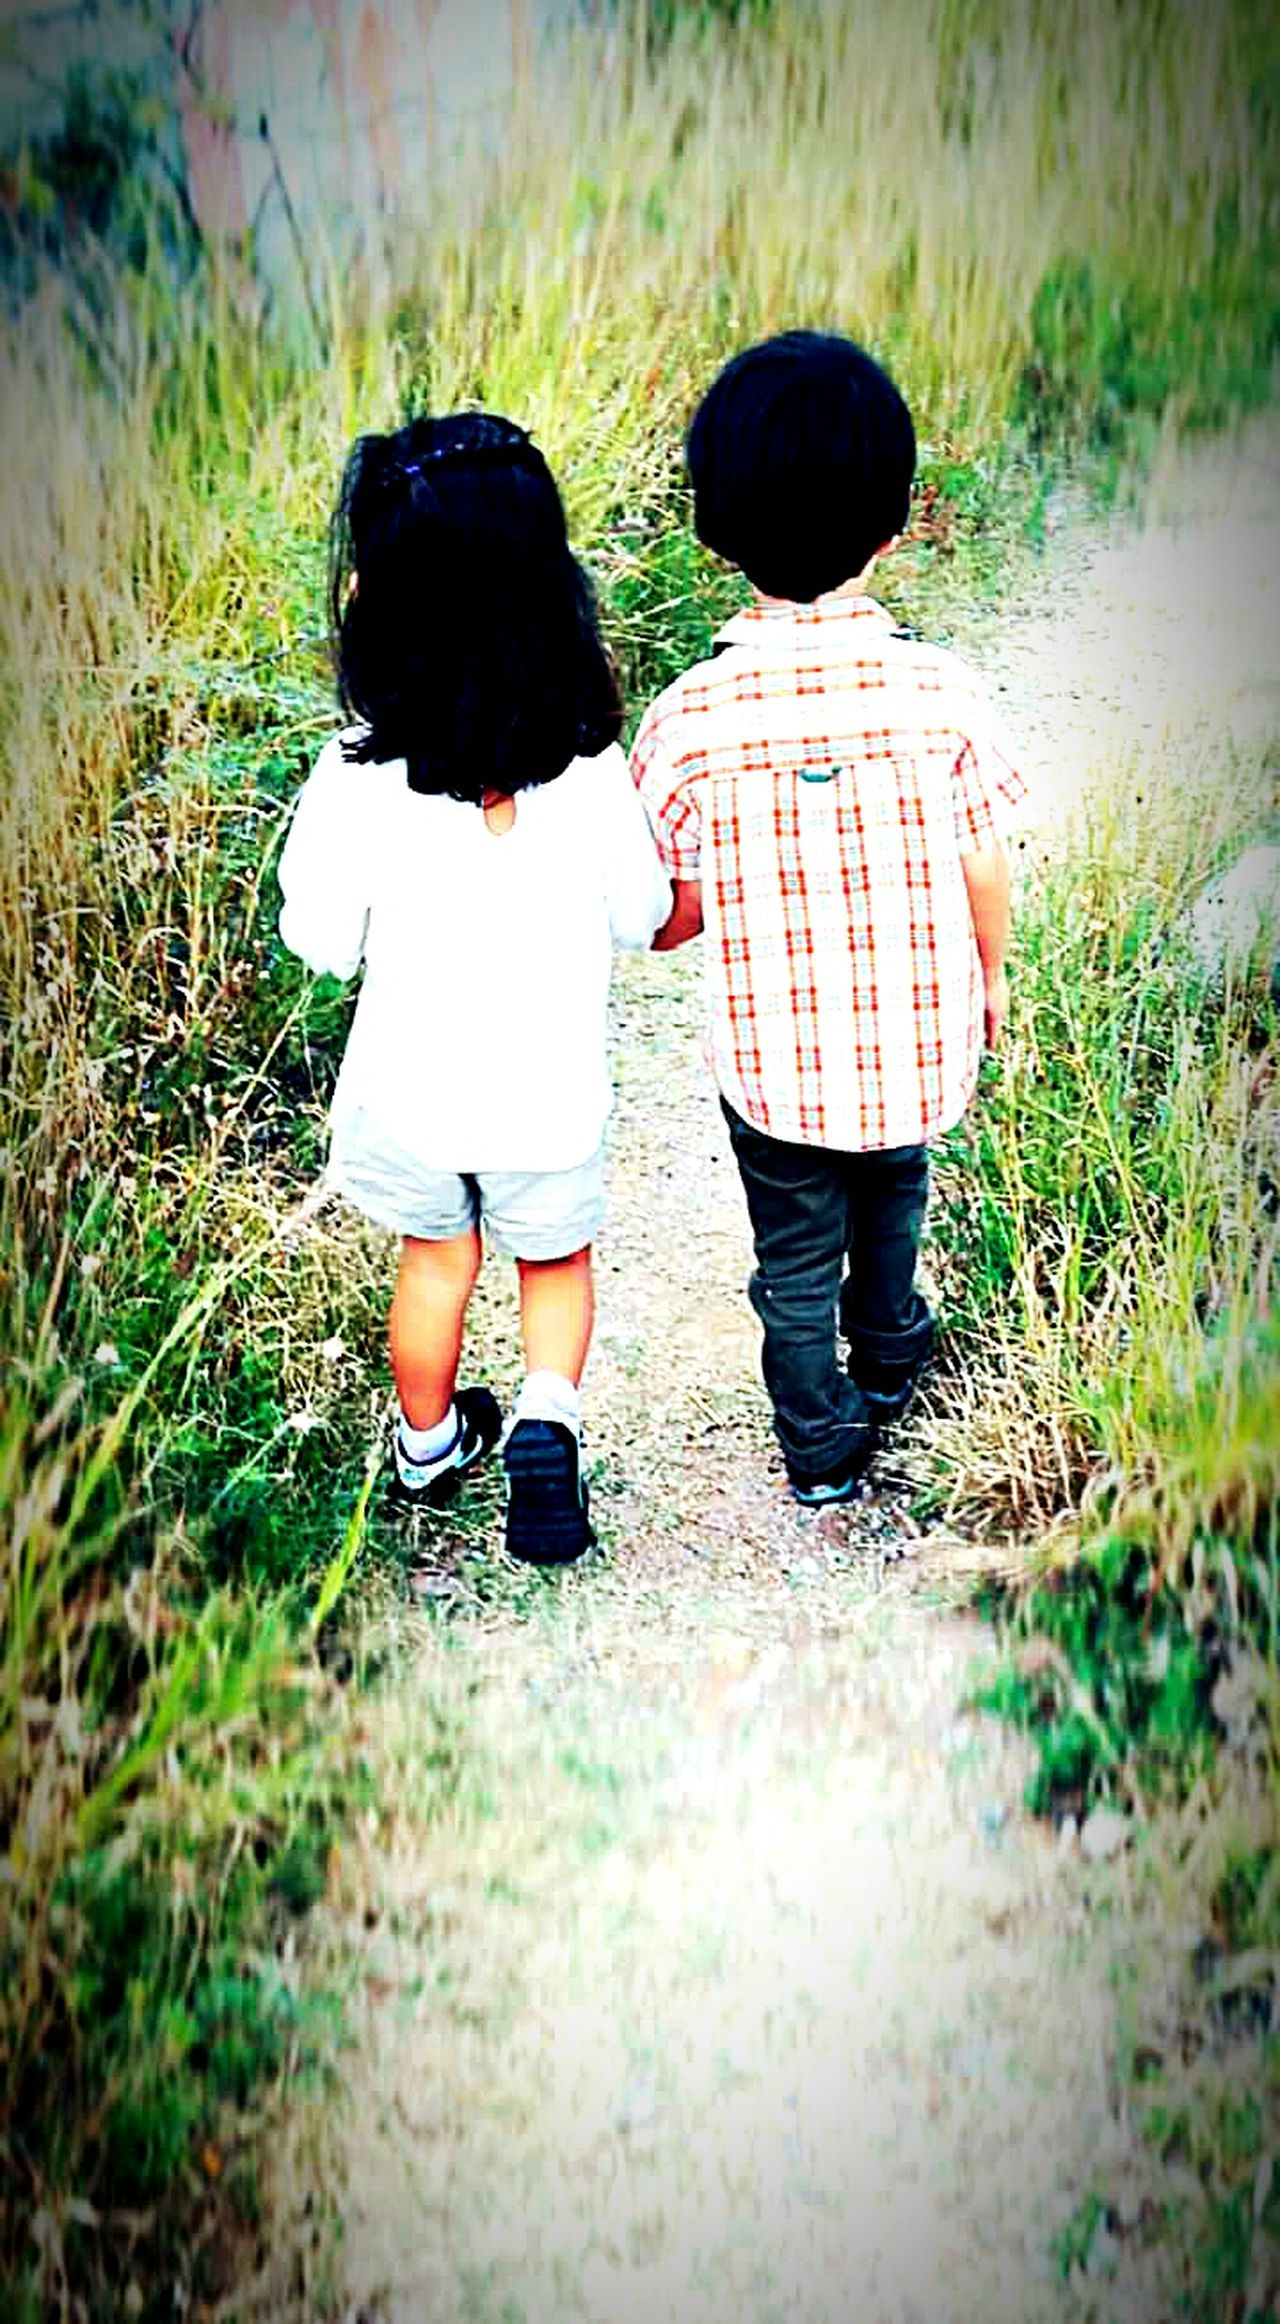 Two People Friendship Kids Being Kids Niñosfelices Day Kidsphotography Kids Kids Photography Kids Of EyeEm